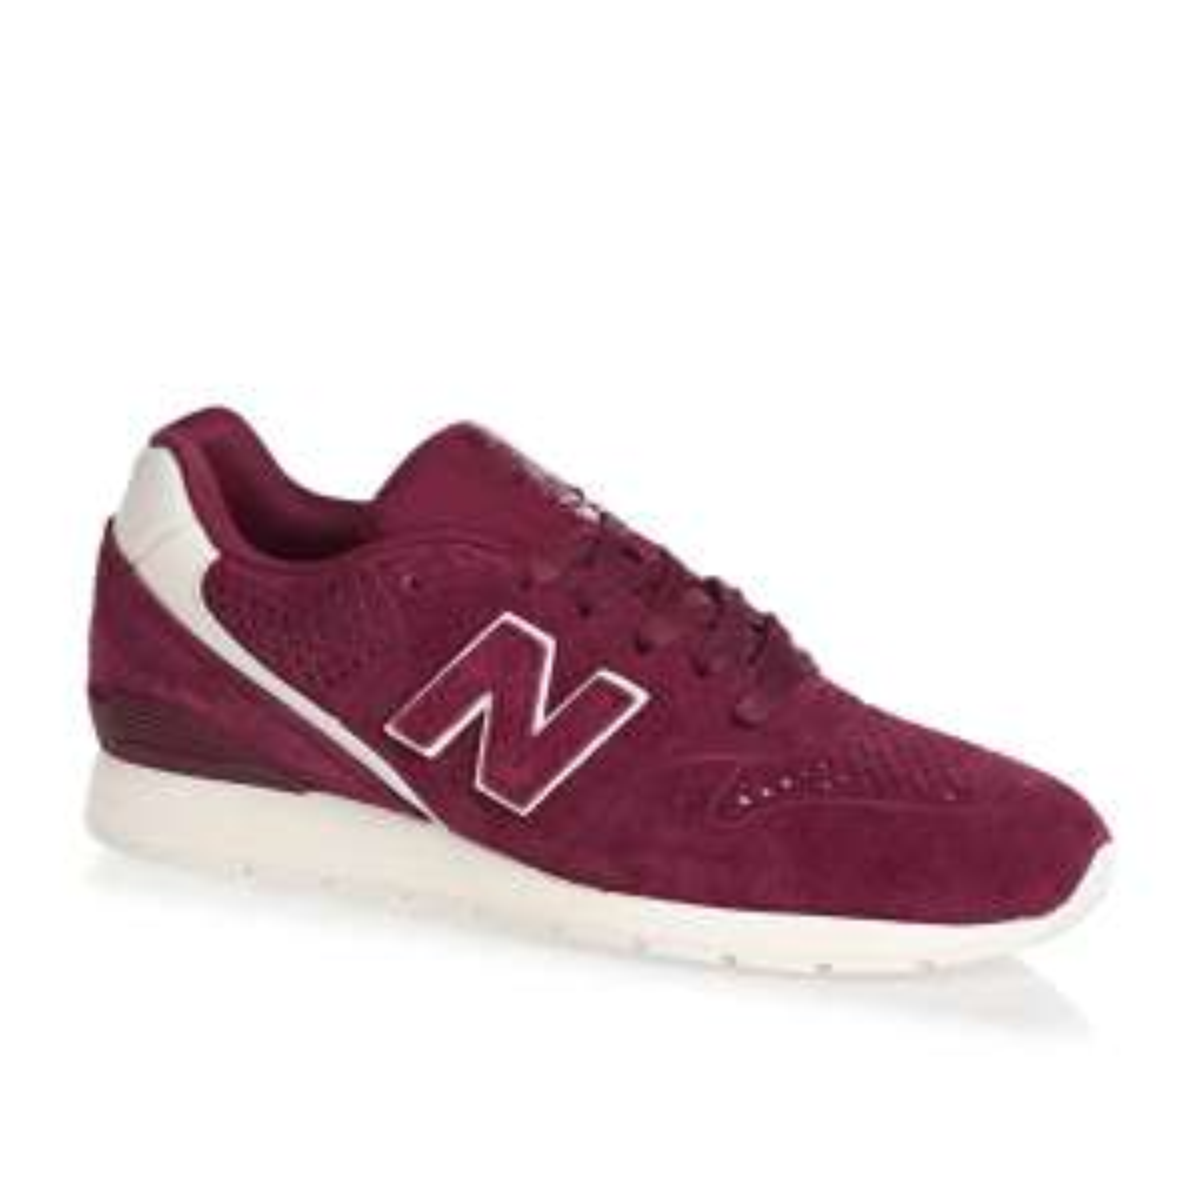 Chaussures New Balance MRL996 - Plusieurs tailles au choix